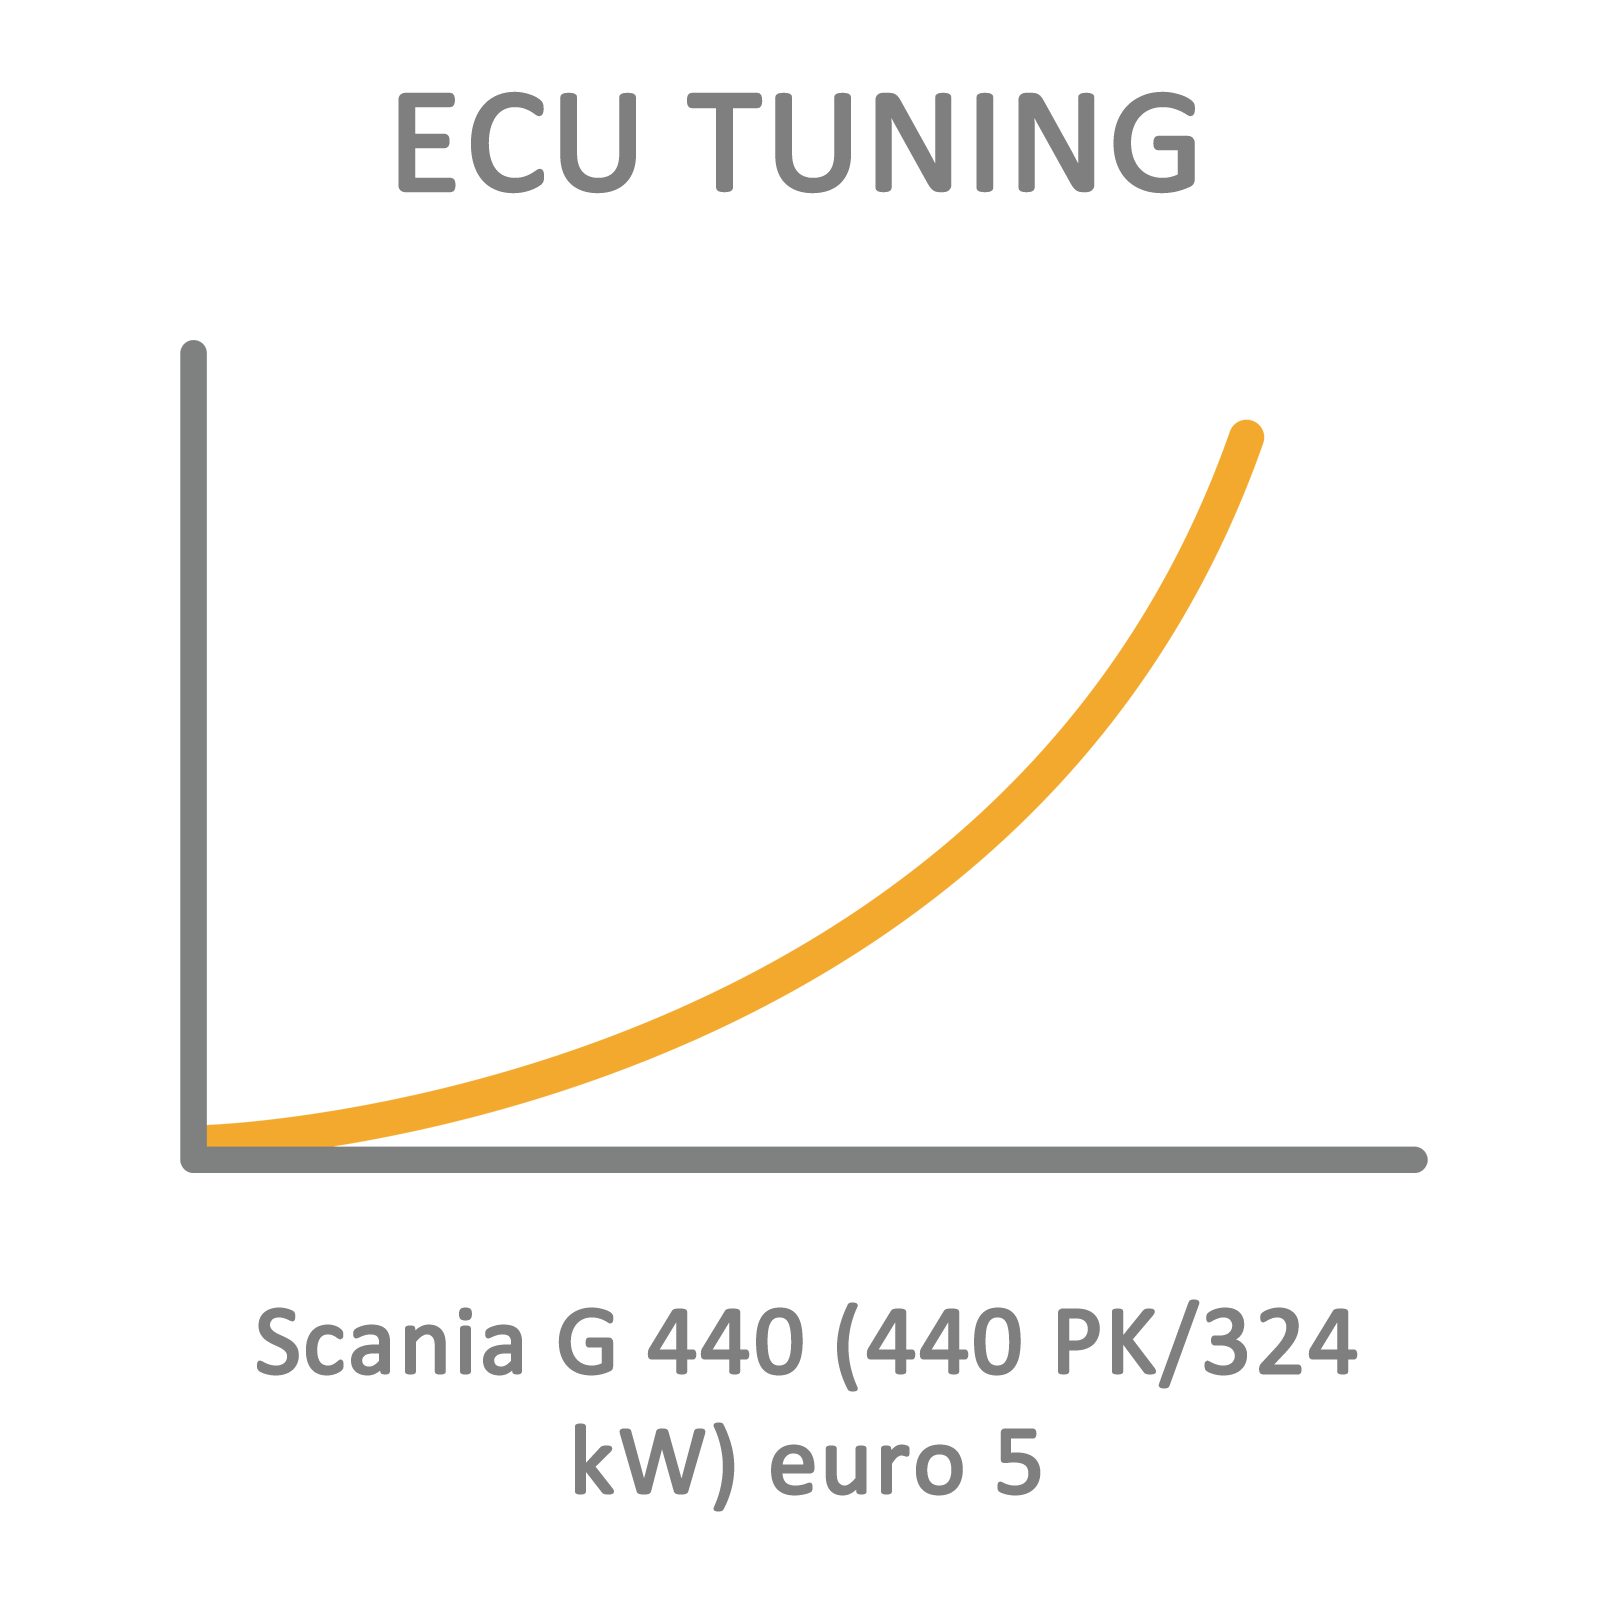 Scania G 440 (440 PK/324 kW) euro 5 ECU Tuning Remapping